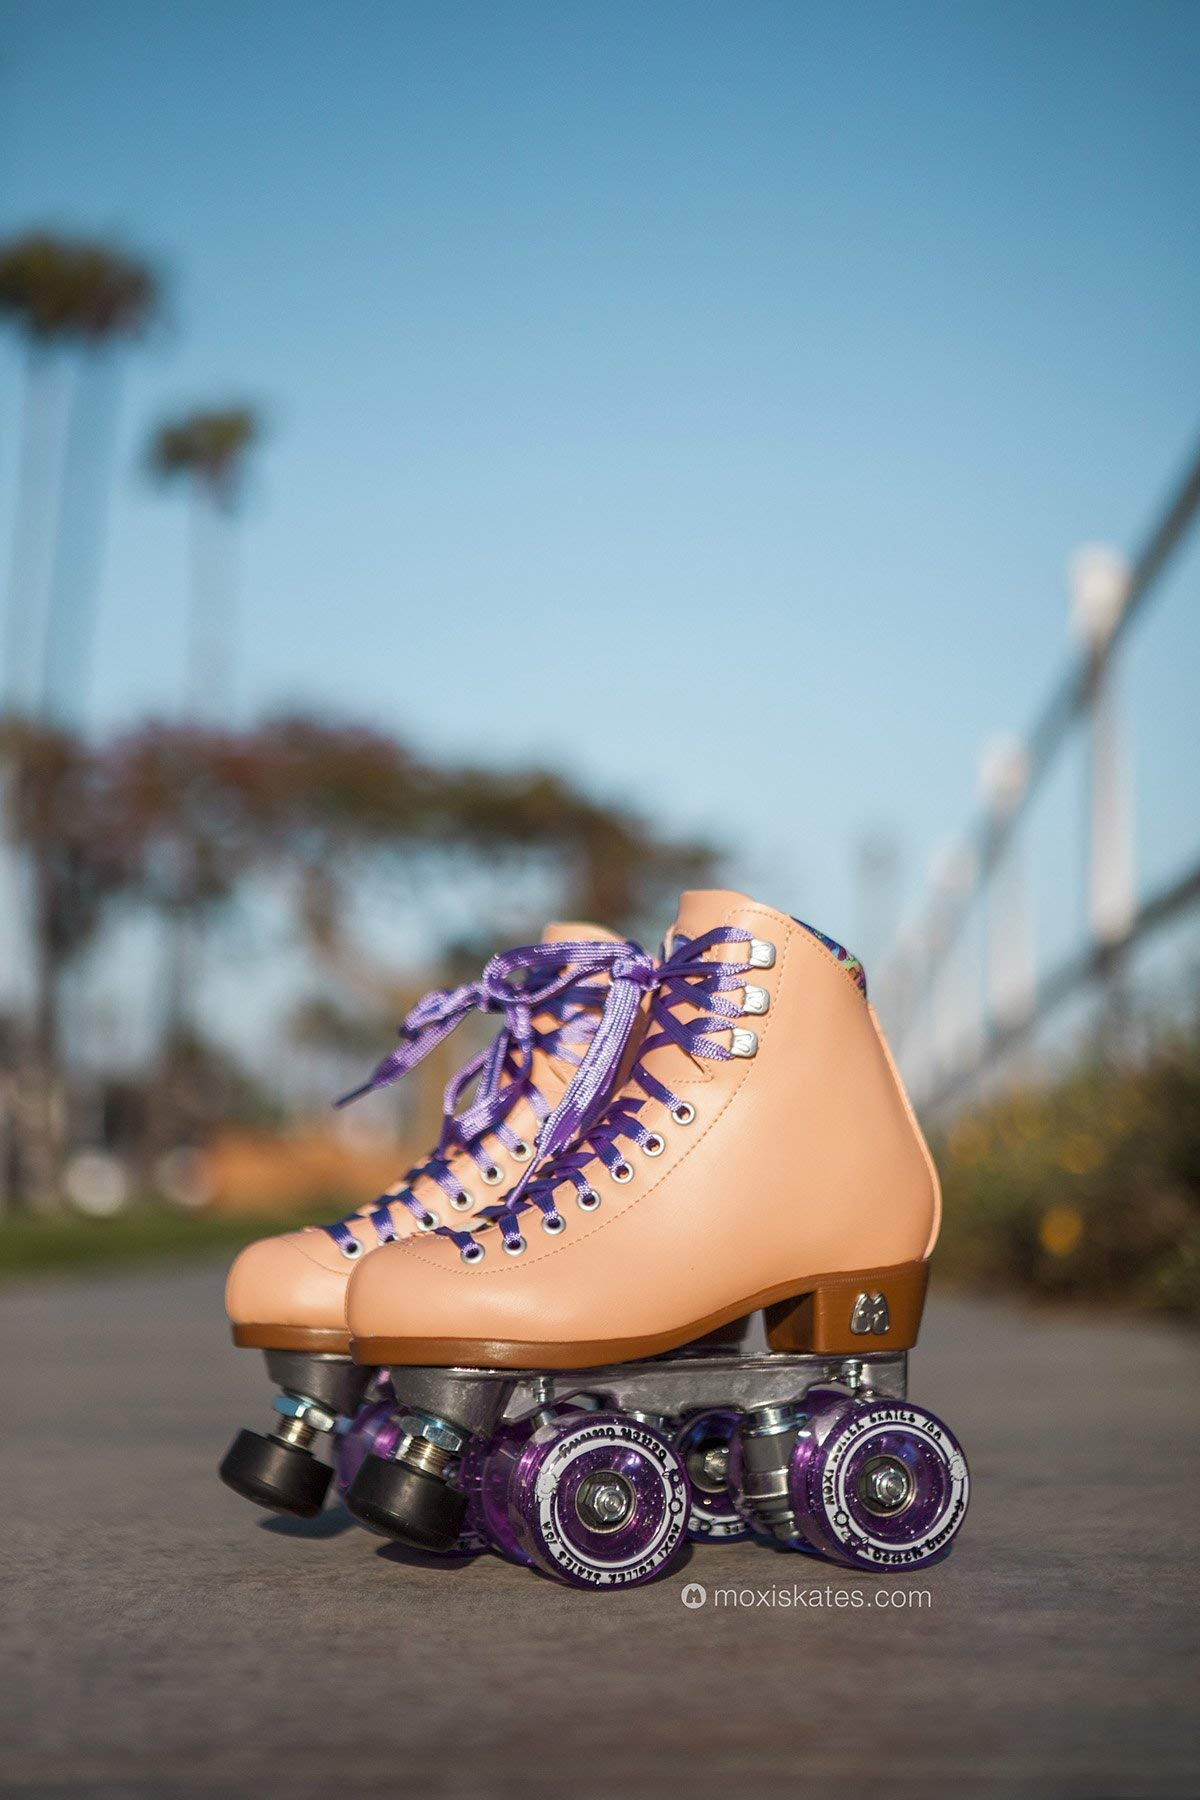 Moxi Skates - Beach Bunny - Fashionable Womens Roller Skates   Peach Blanket   Size 3 by Moxi (Image #4)